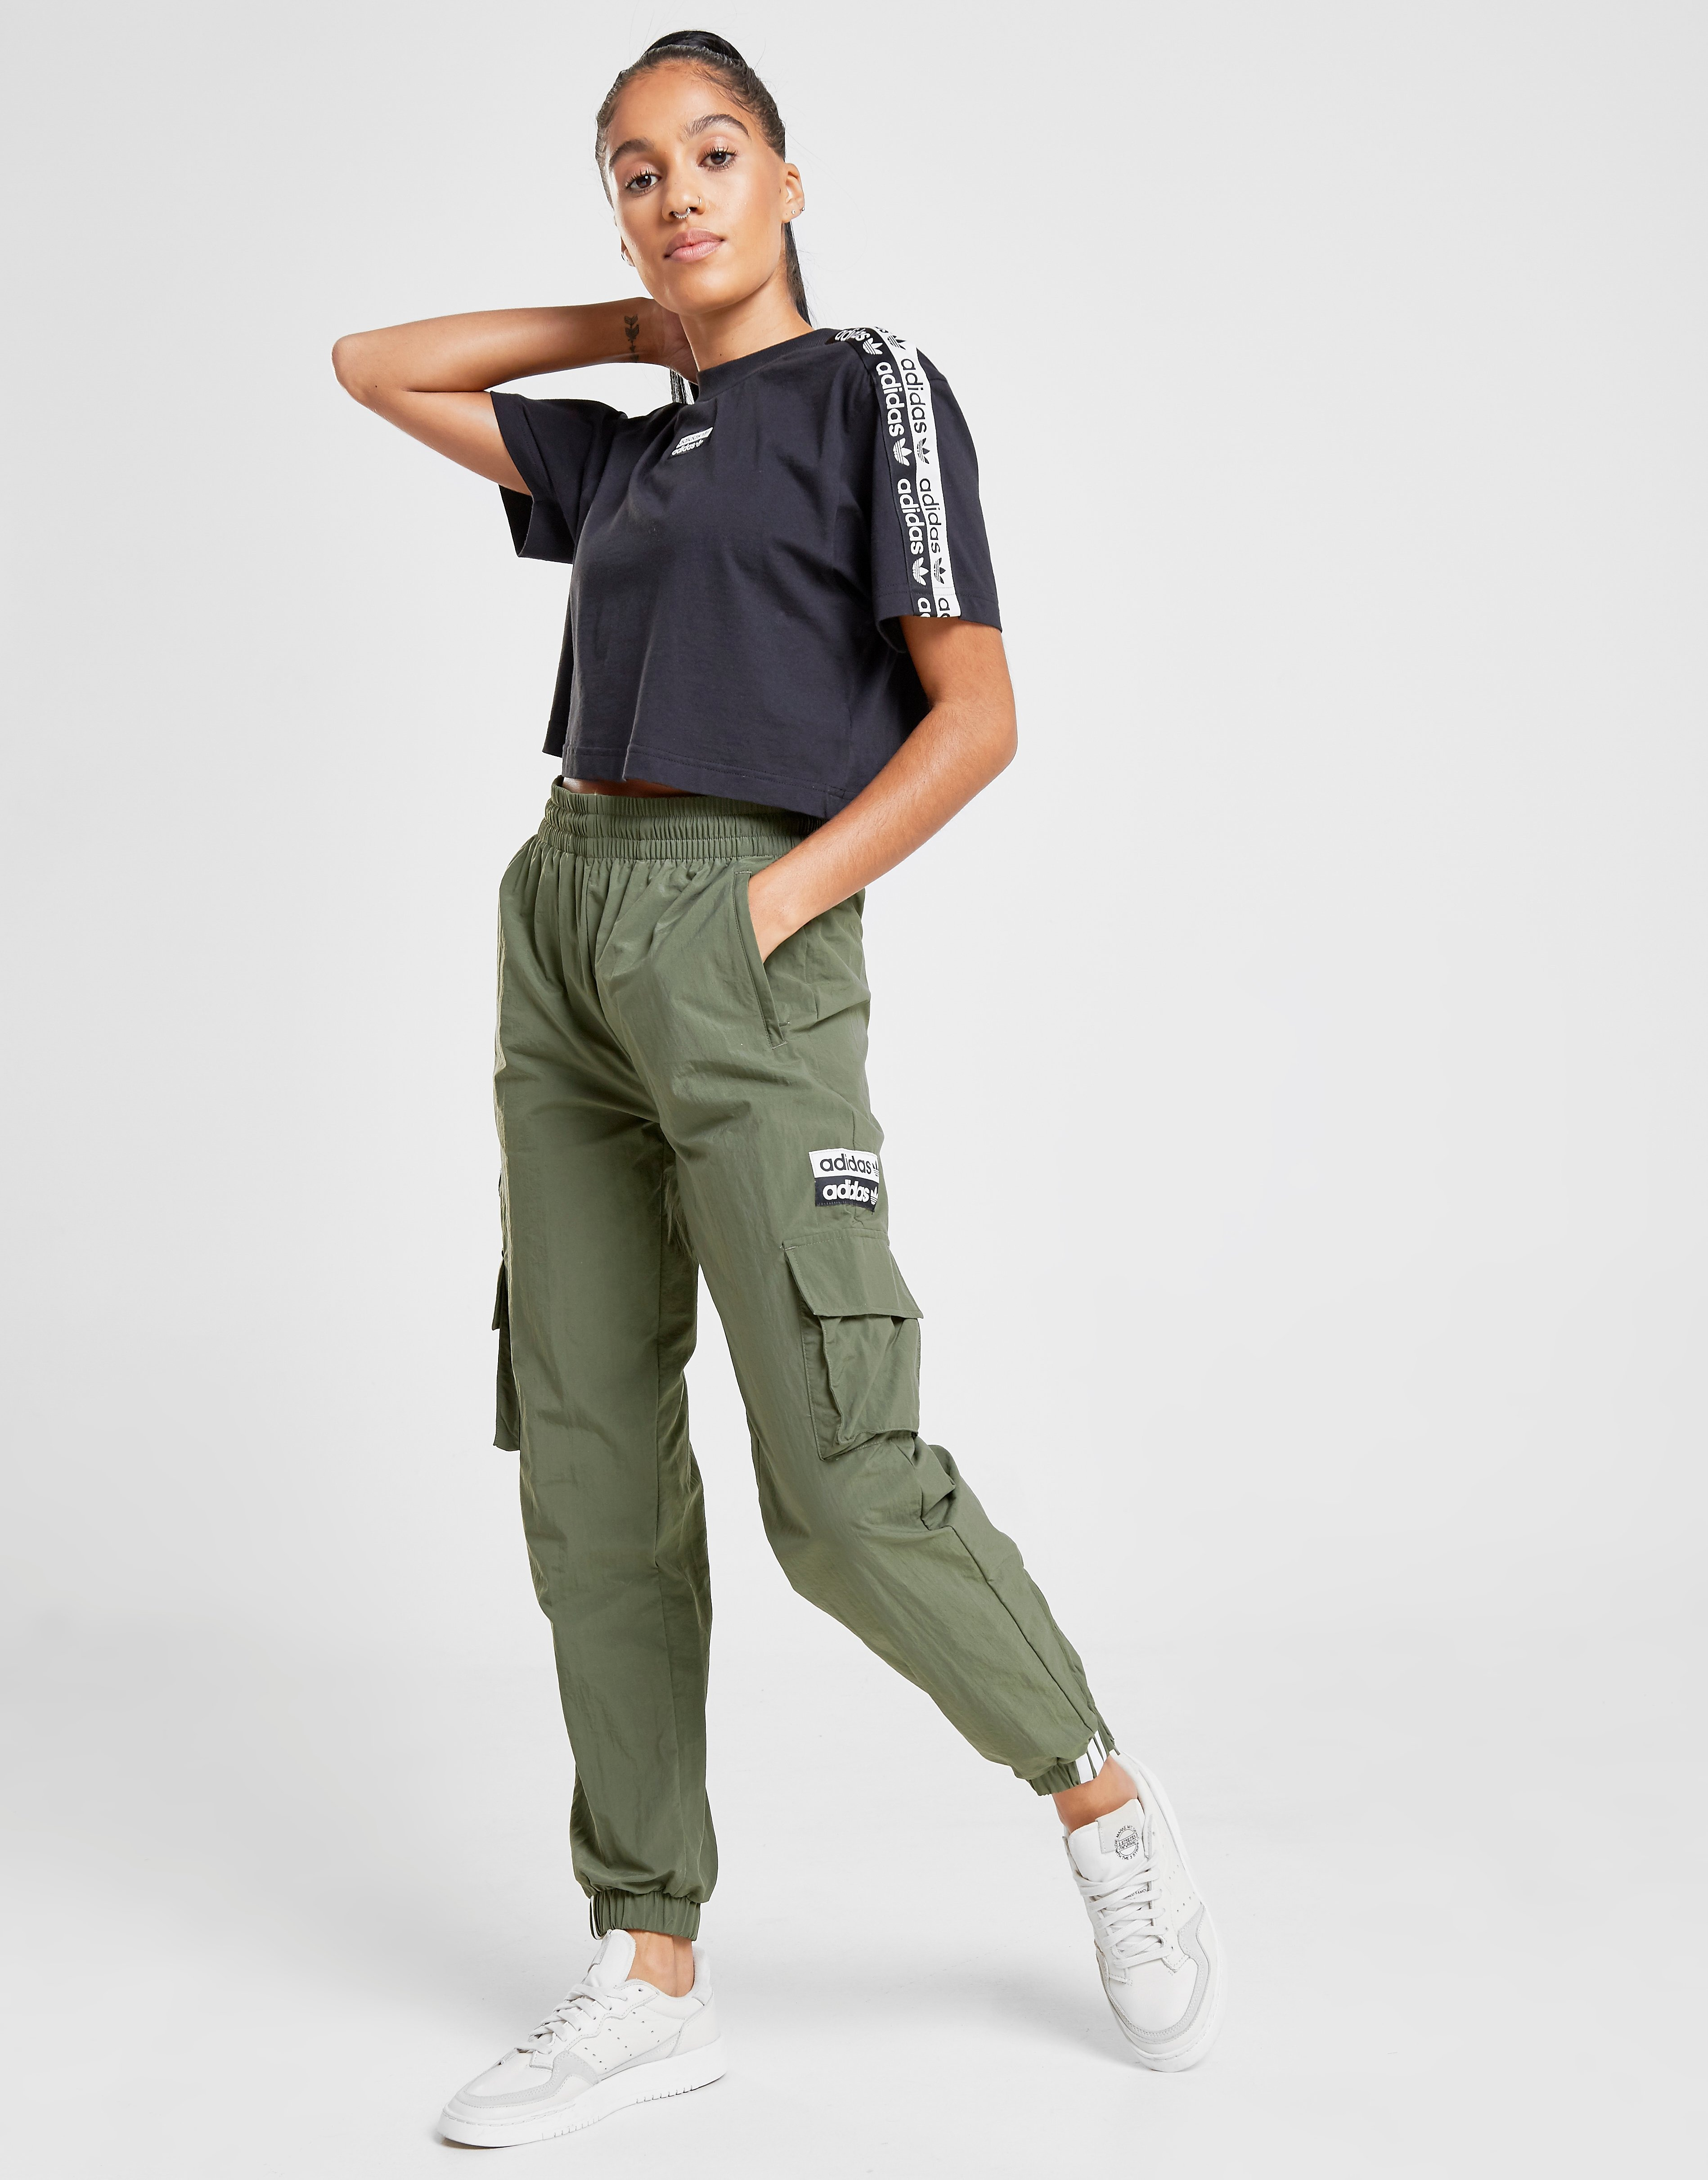 adidas Originals Pantalon de Survêtement Cargo Femme | JD Sports